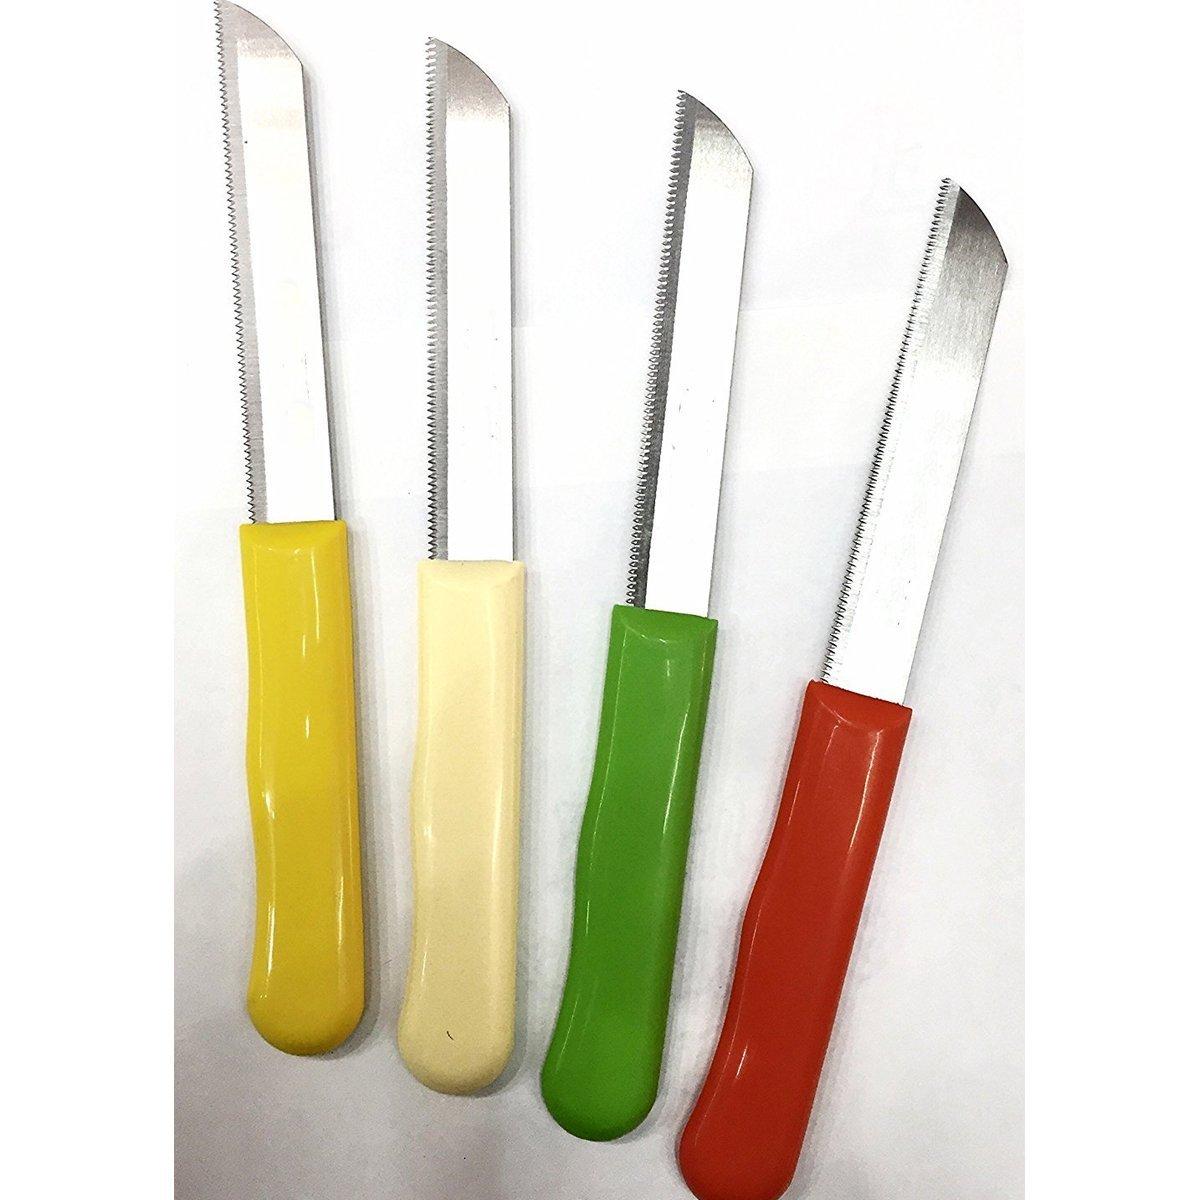 Stainless Steel Kitchen Knife Set-1 pc - Unnati Enterprises